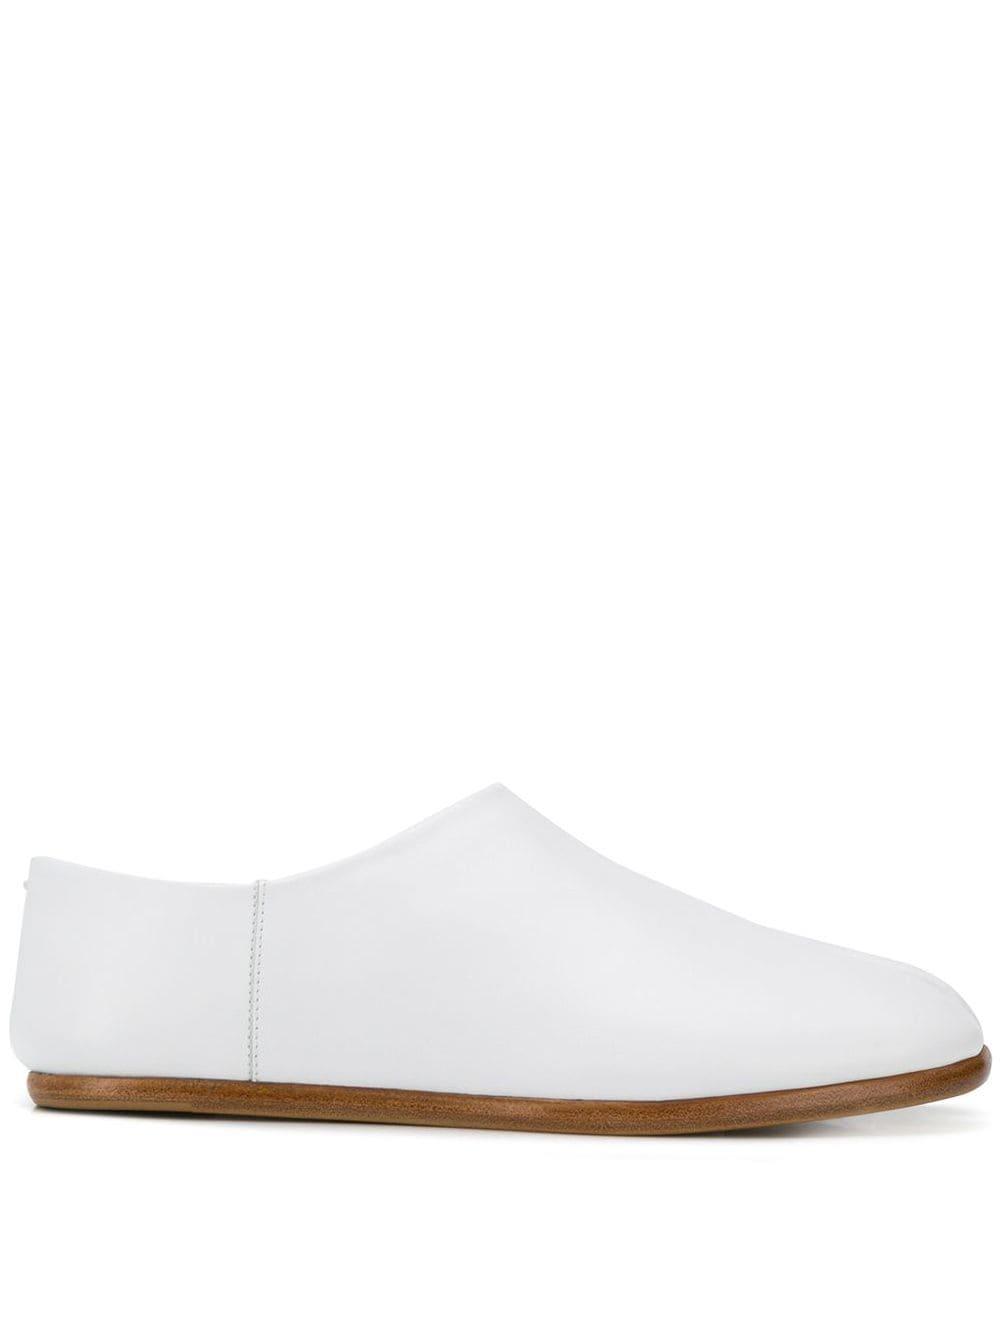 Maison Margiela Slipper mit Tabi-Kappe - Weiß